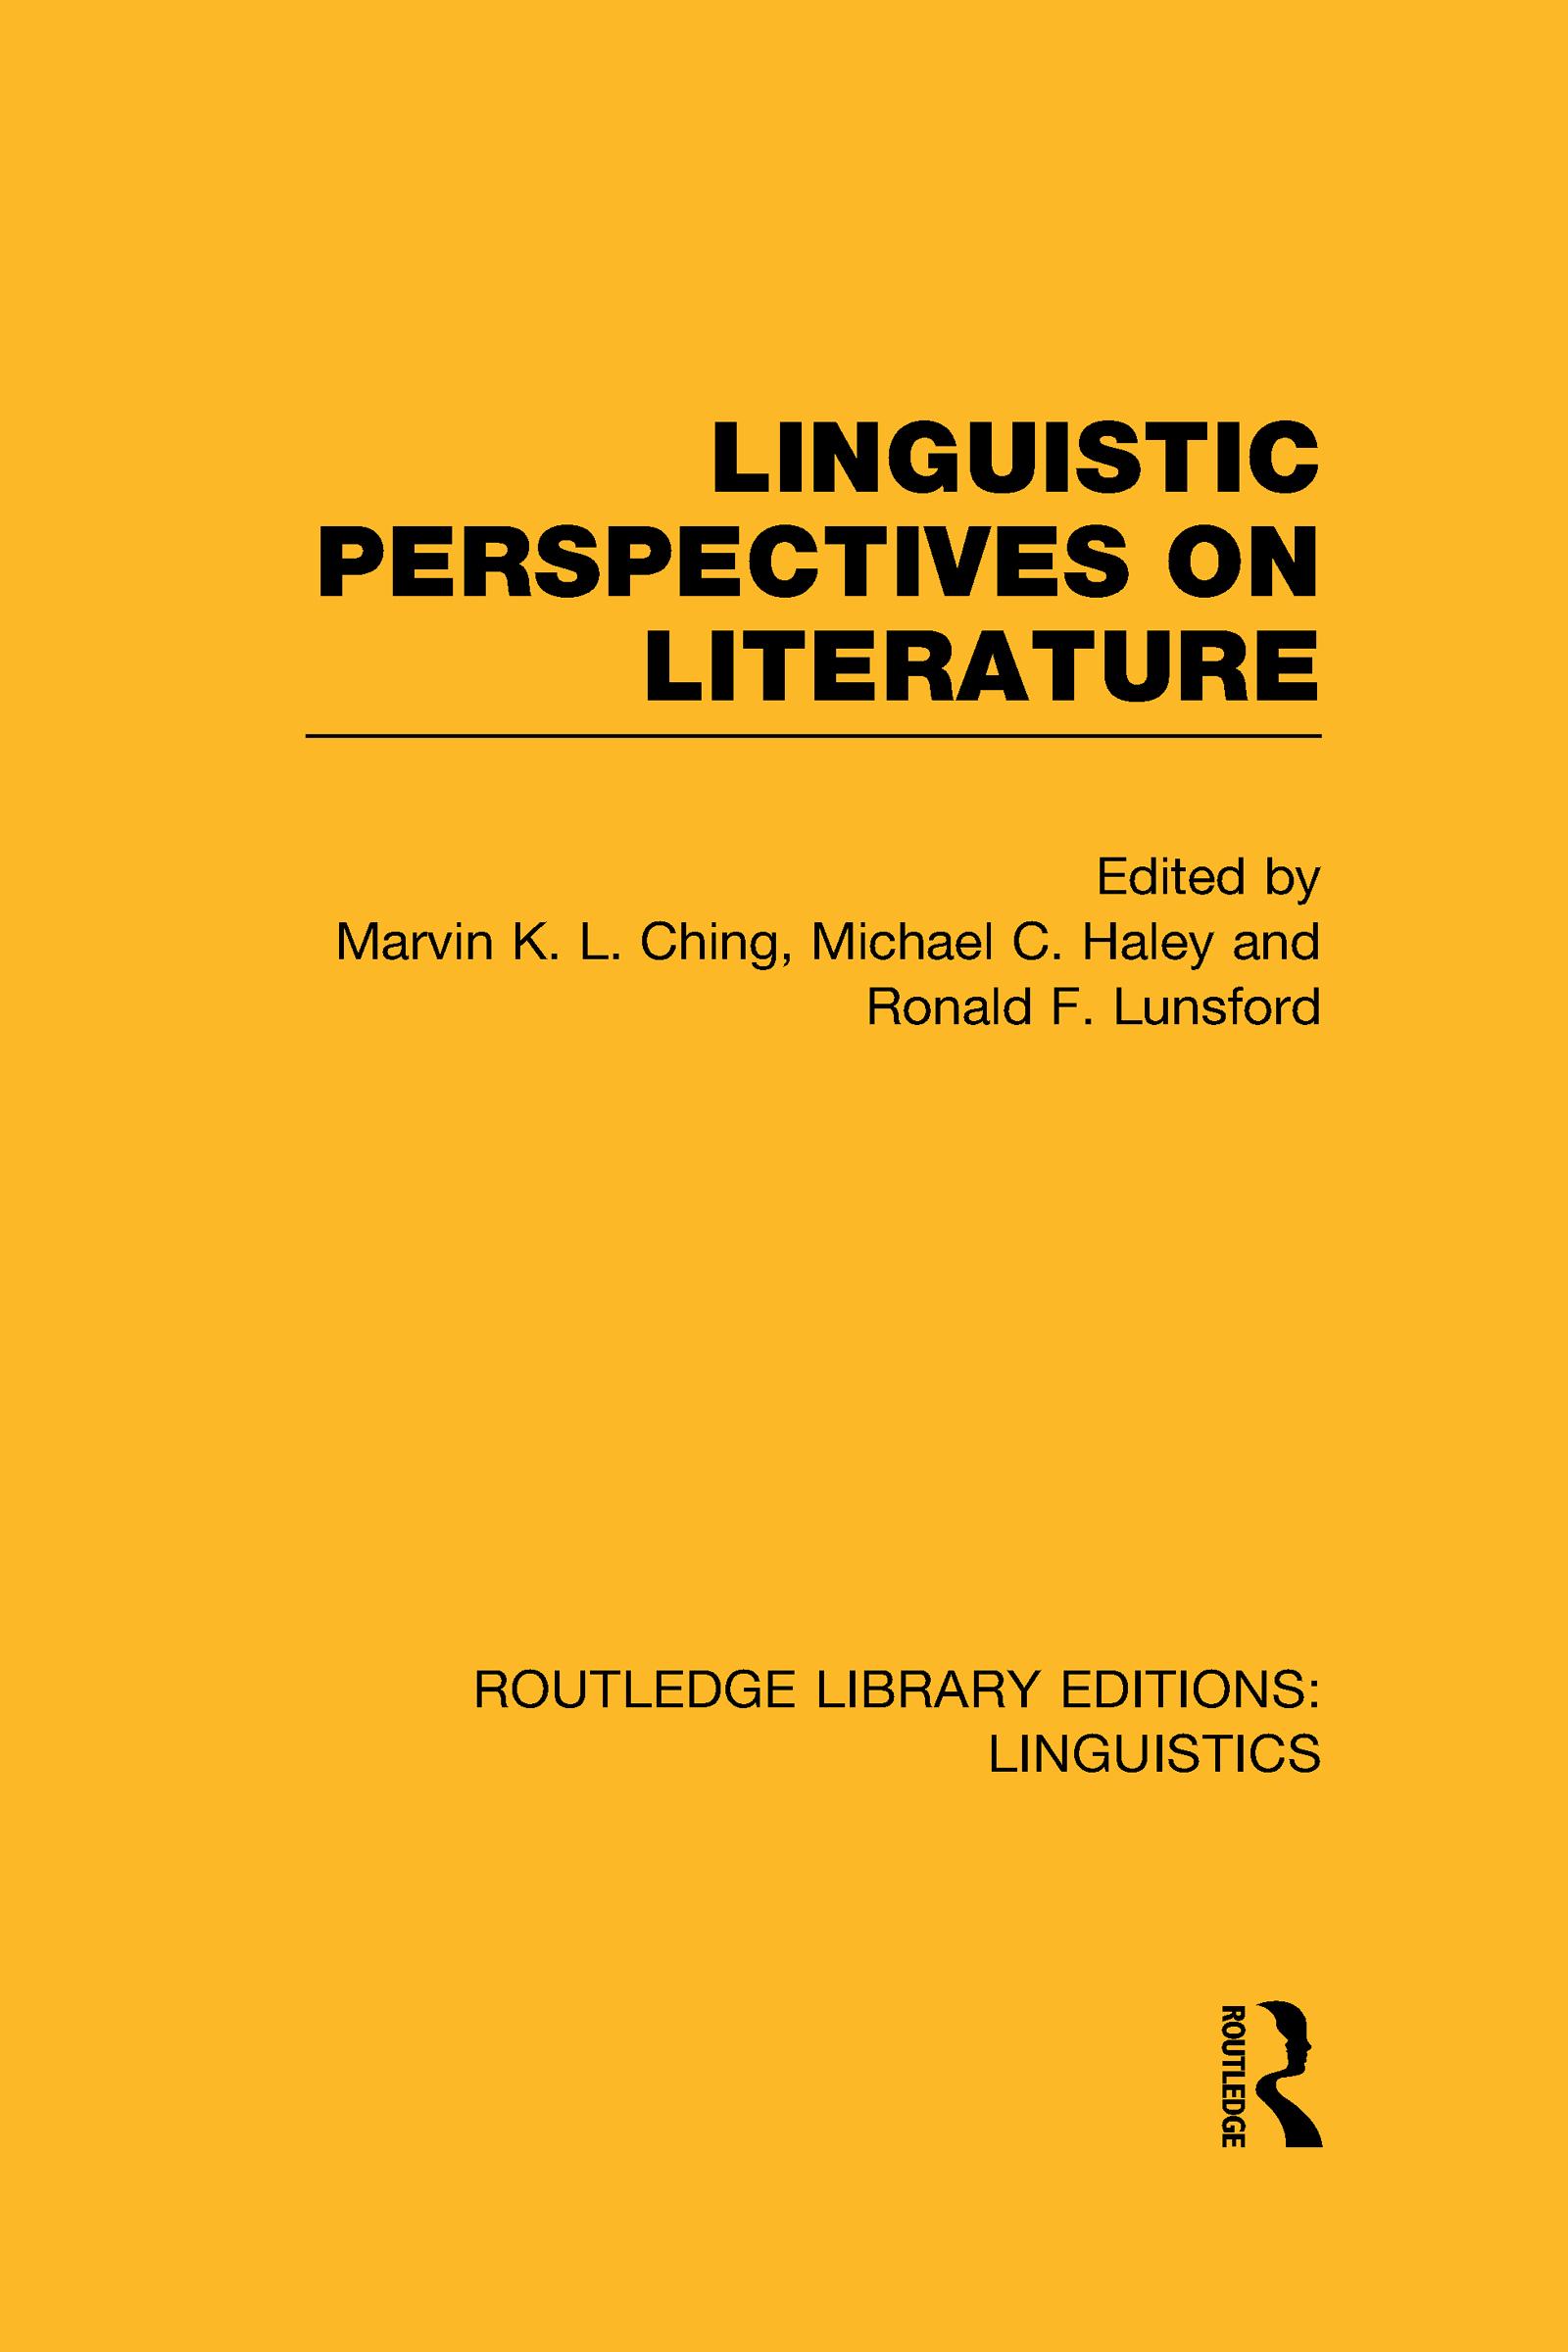 Linguistic Perspectives on Literature (RLE Linguistics C: Applied Linguistics): 1st Edition (Hardback) book cover